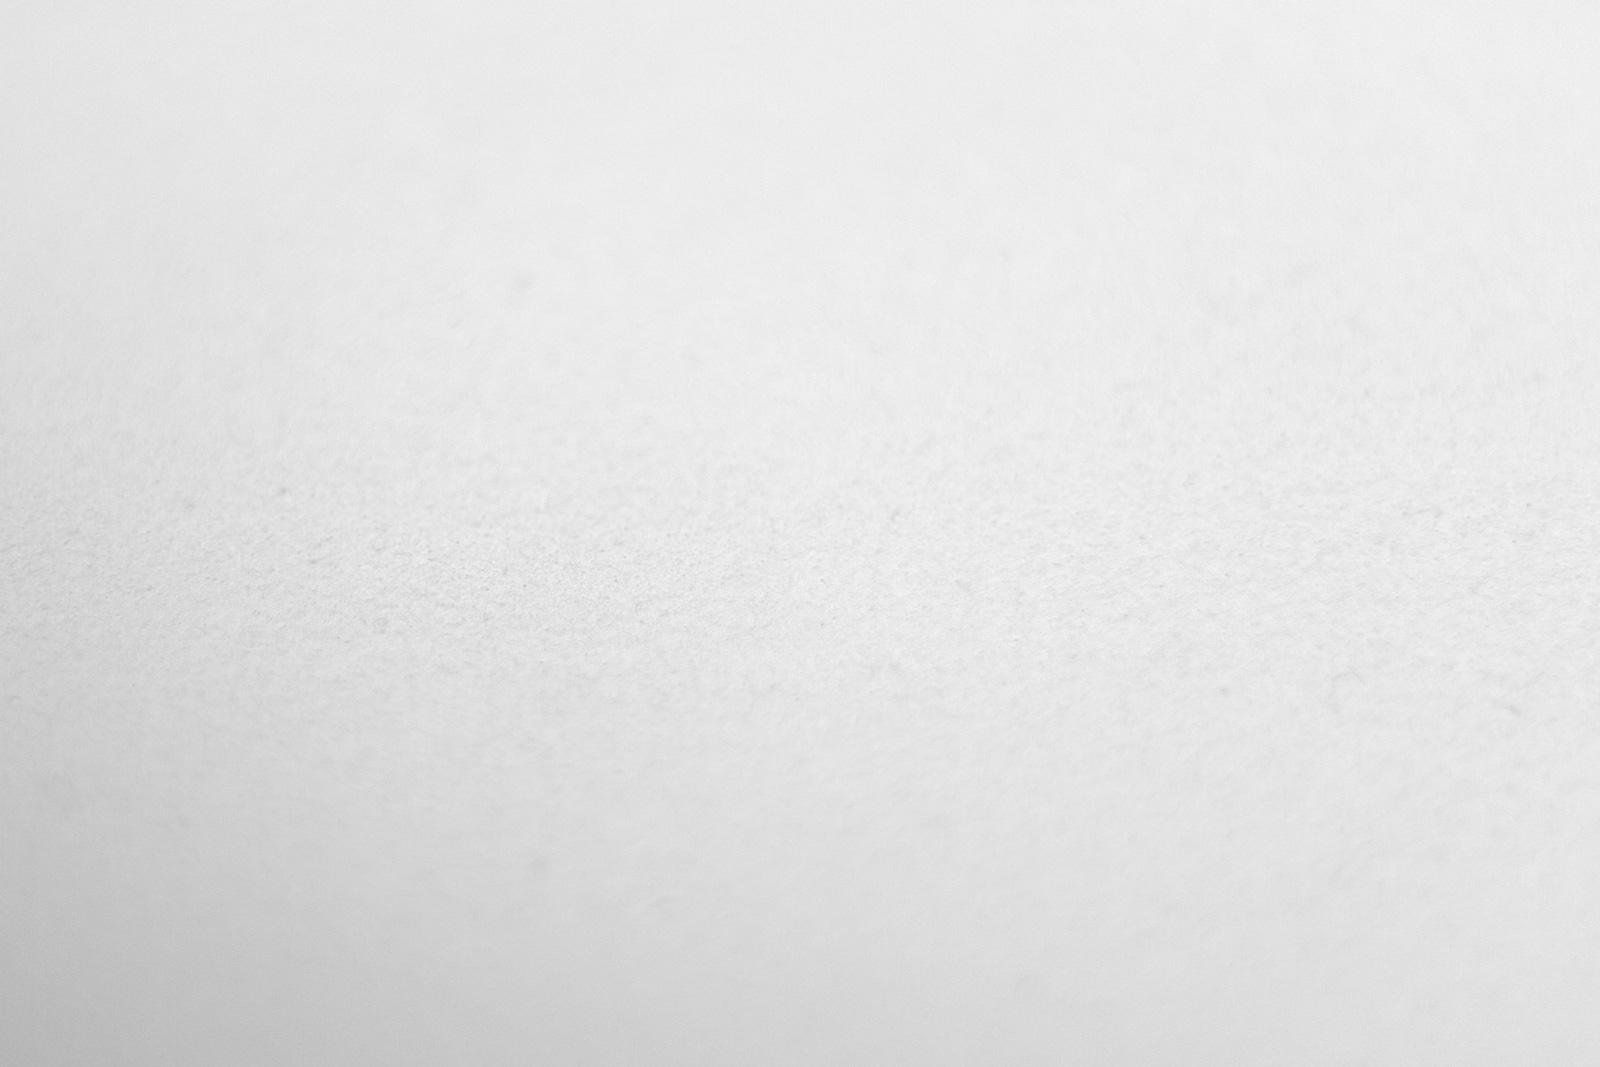 Acoustic Plaster - Acoplaster for White Ceiling Texture Seamless  166kxo